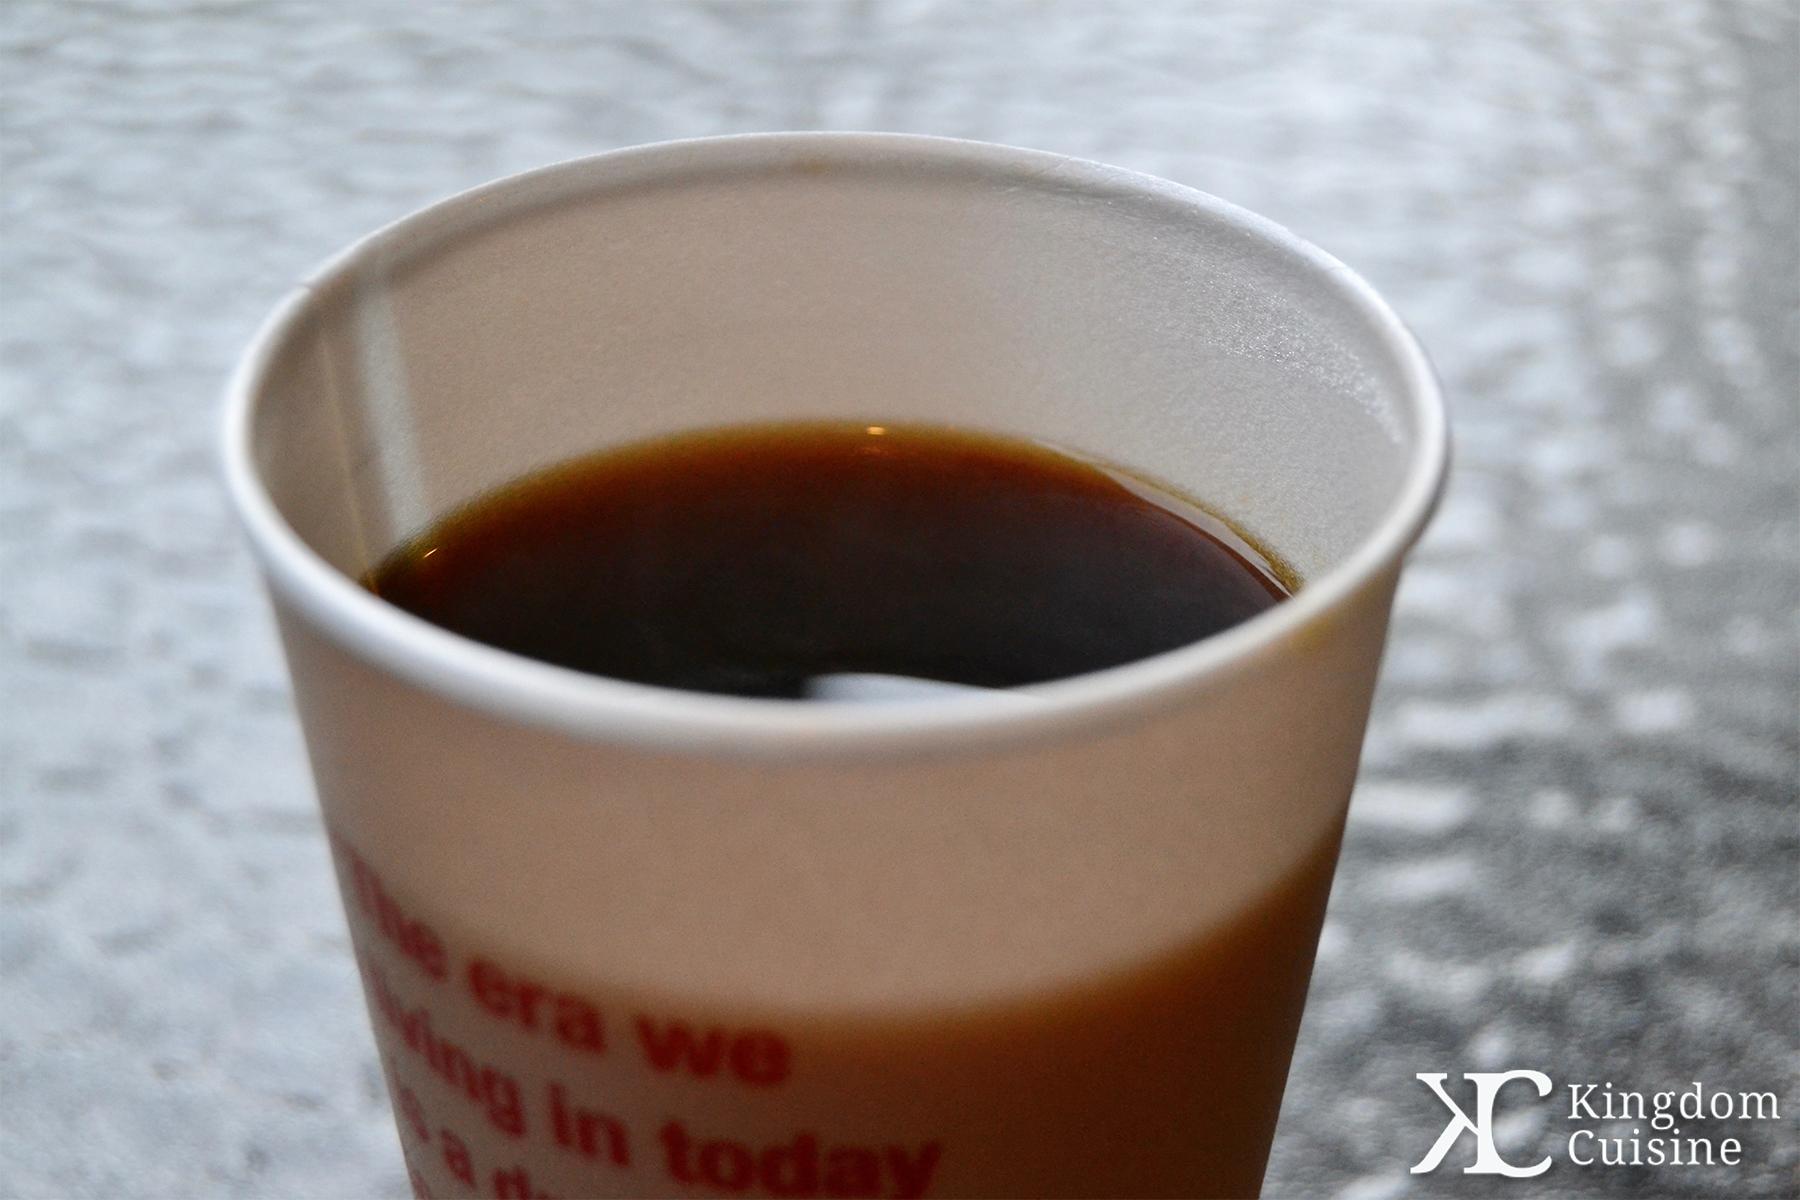 chicorycoffee11